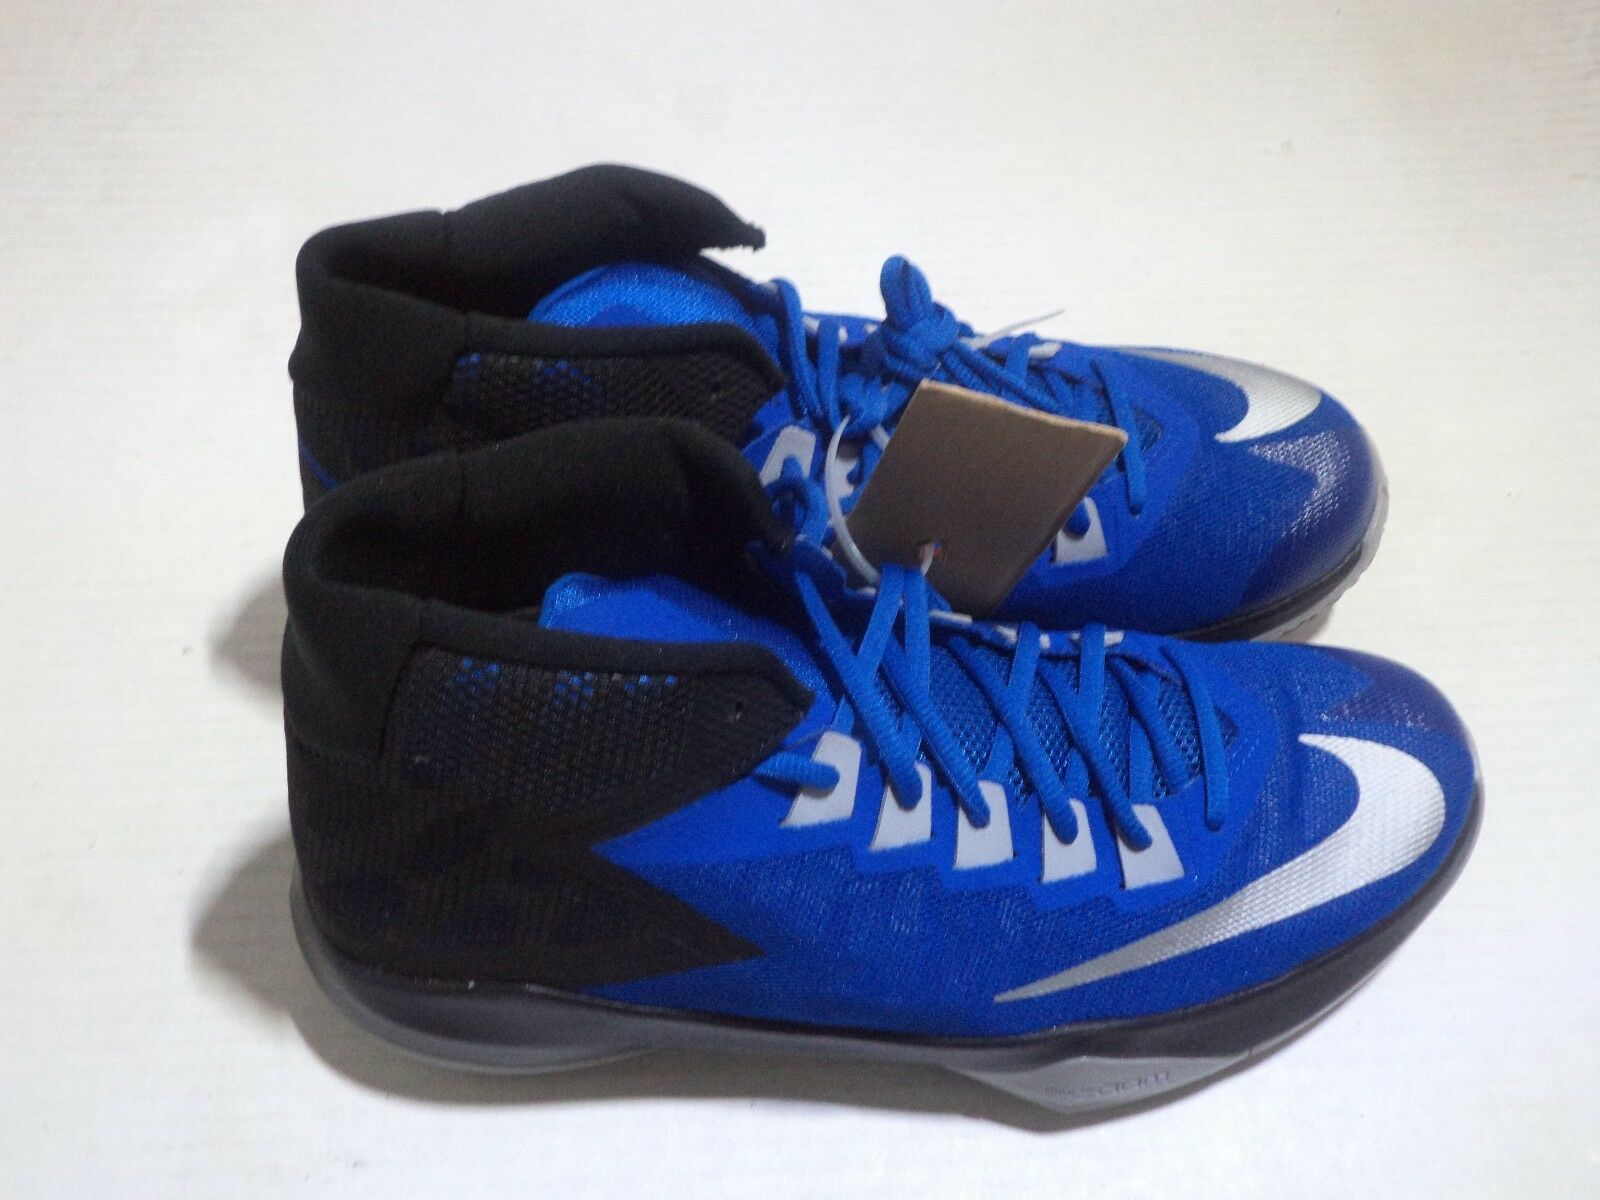 Nike Men Zoom Devosion Athletic Basketball Shoe Size 10 Color Blue,White & Black